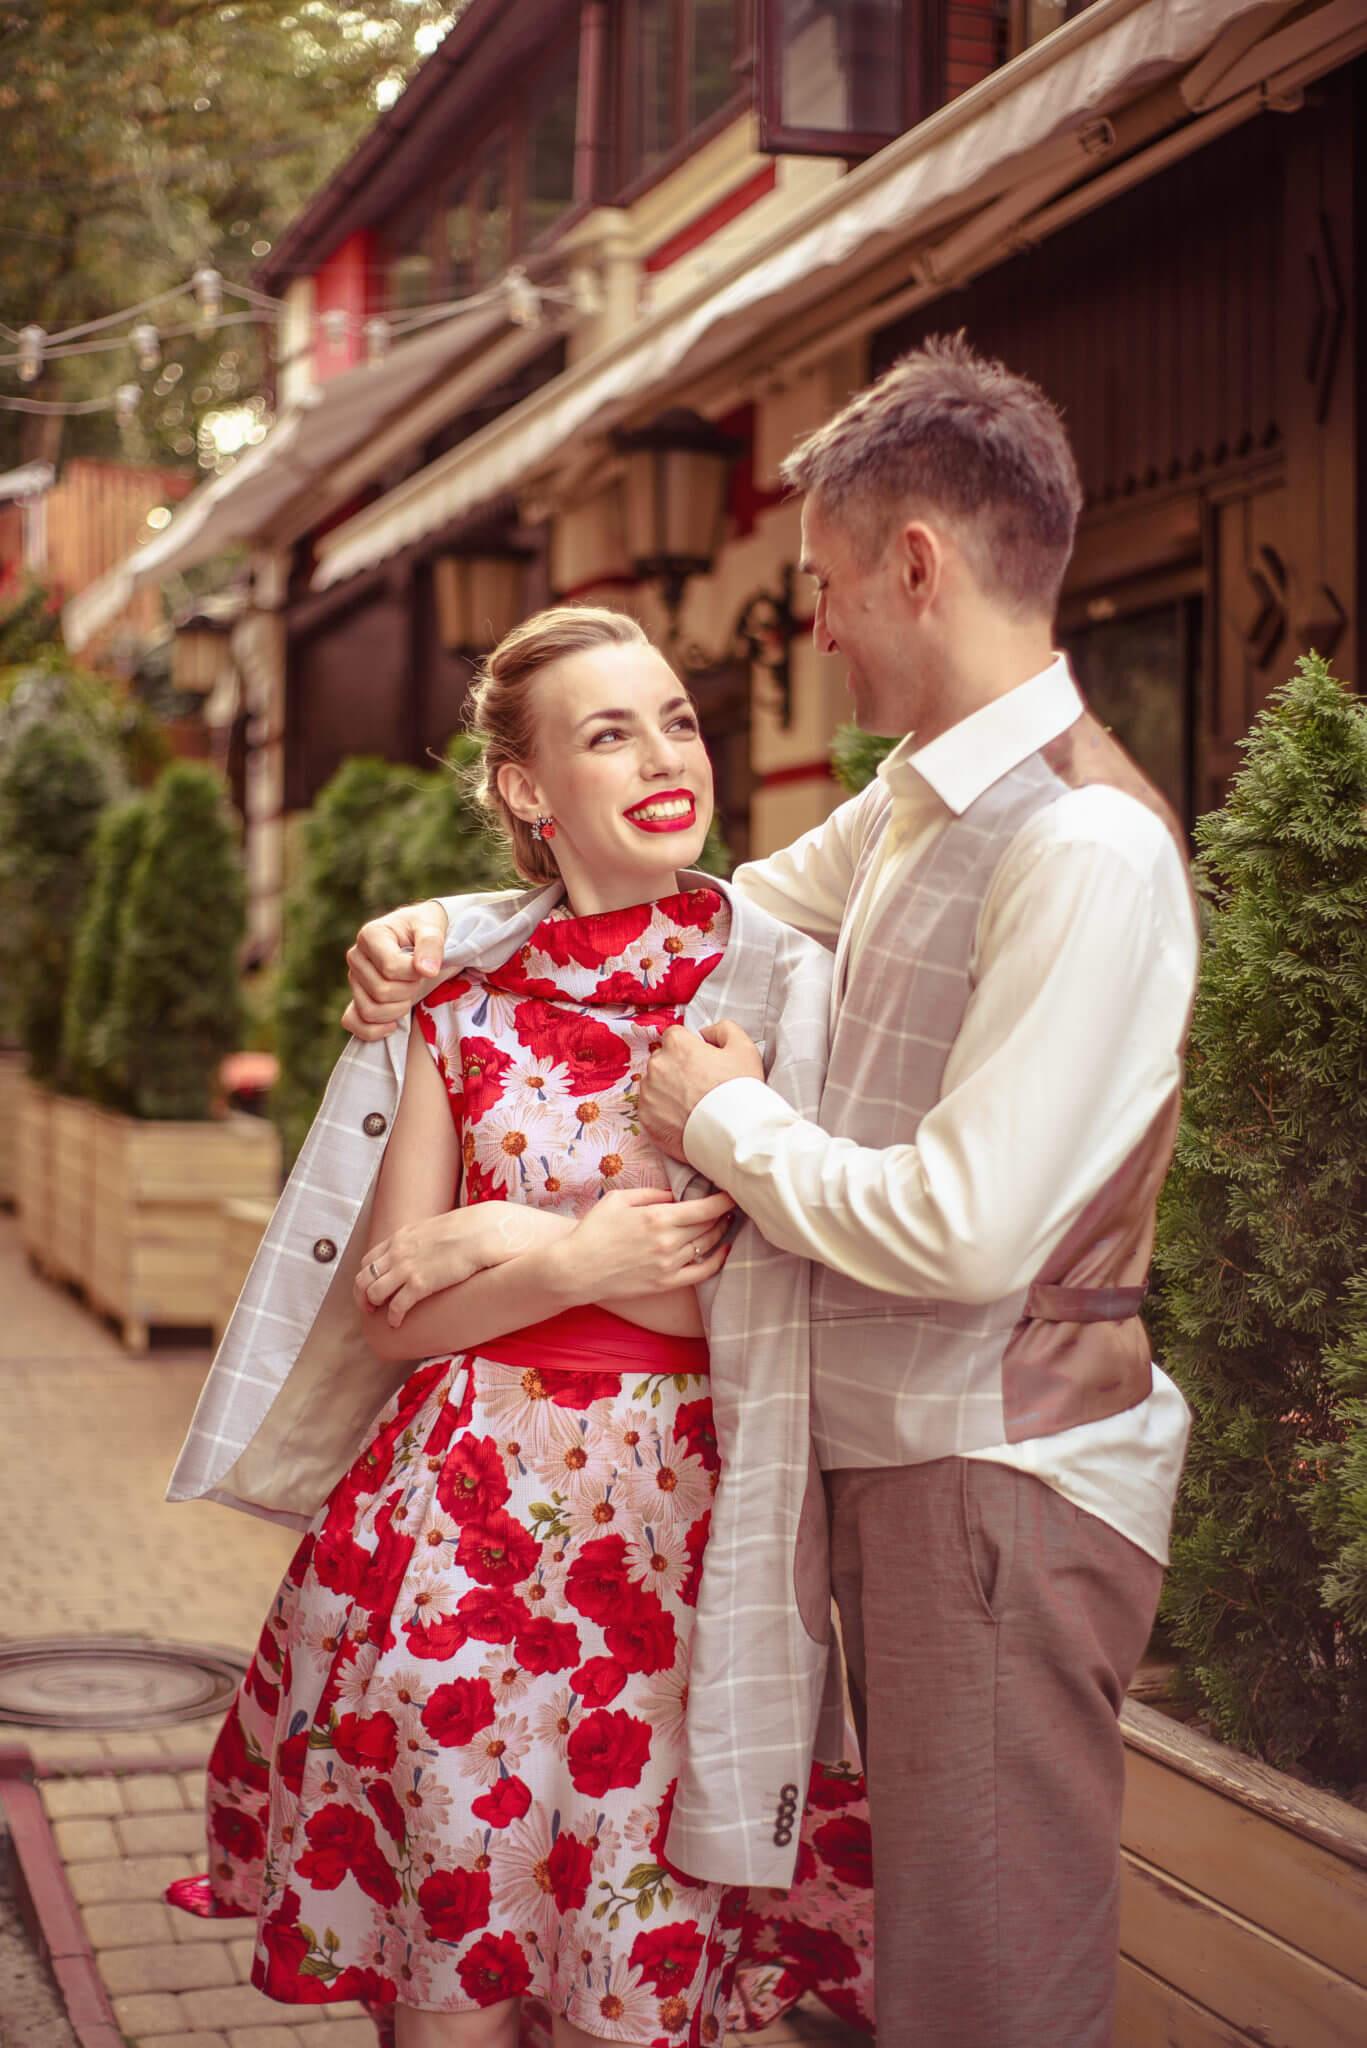 Love story фотосессия на природе, прогулка по городу, Воздвиженка, мужчины одевает на девушку пиджак, ph Постникова Алиса